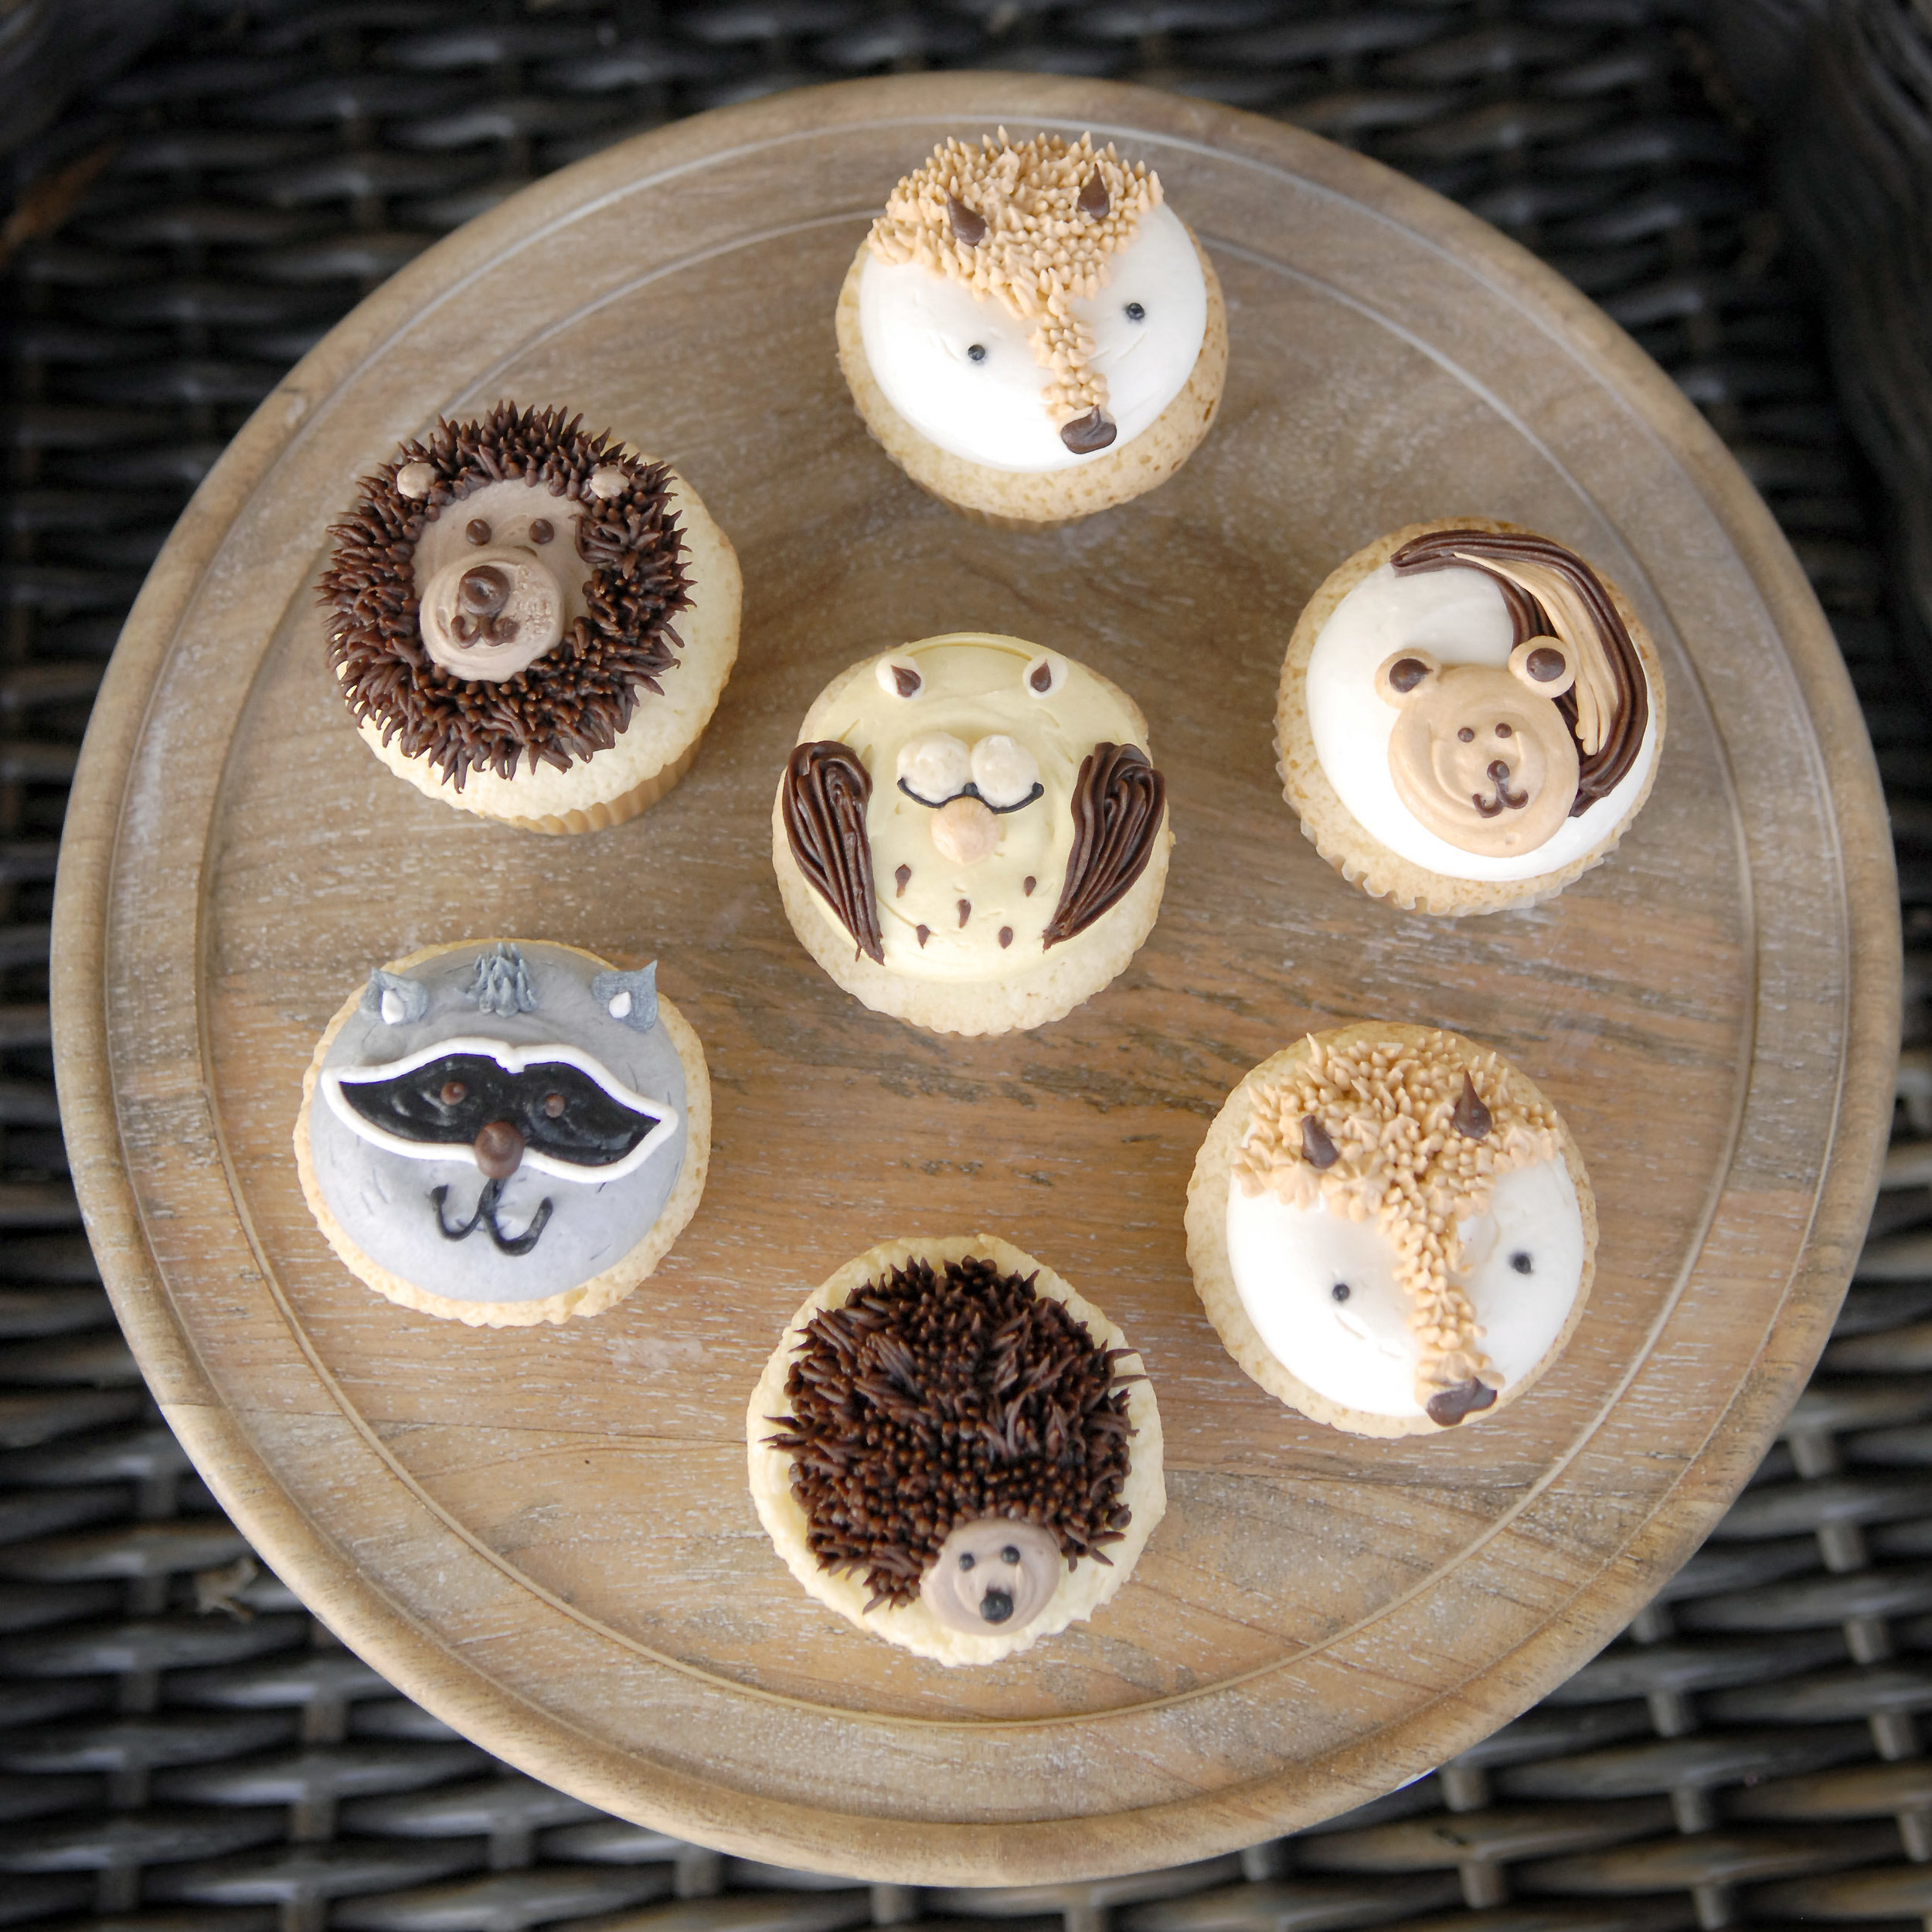 Custom_decorated_cupcakes_012.jpg